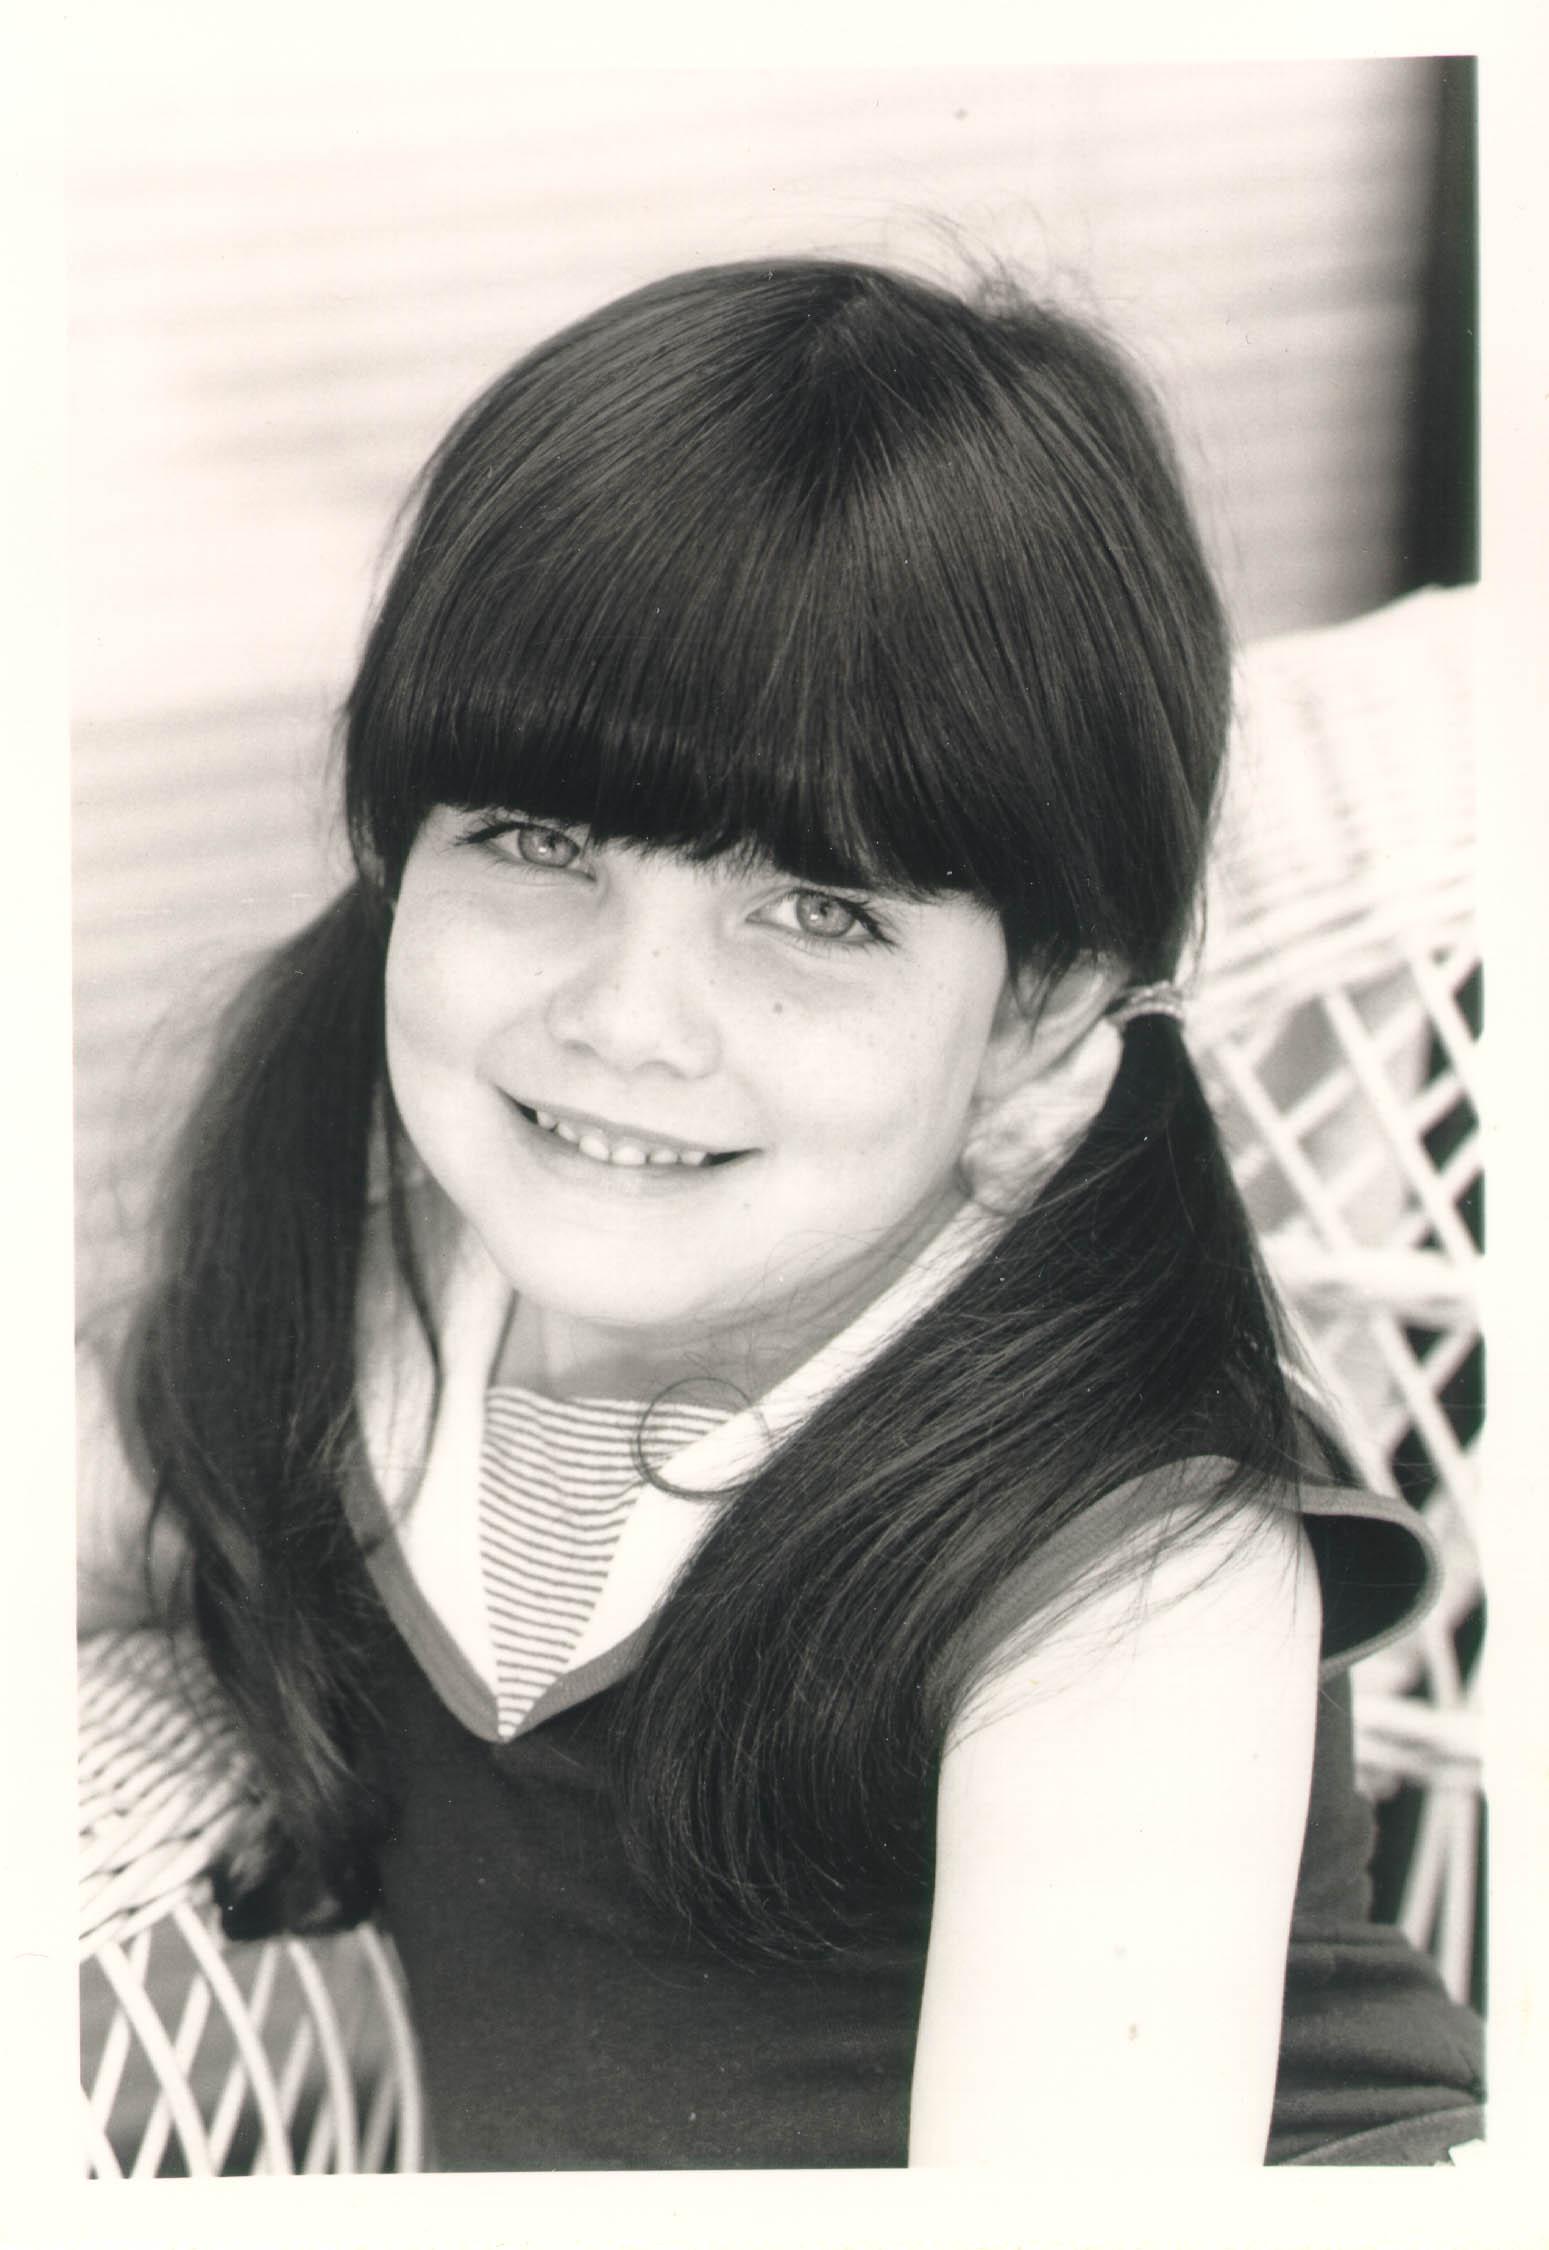 Blanka's granddaughter, Alexis Danielle.